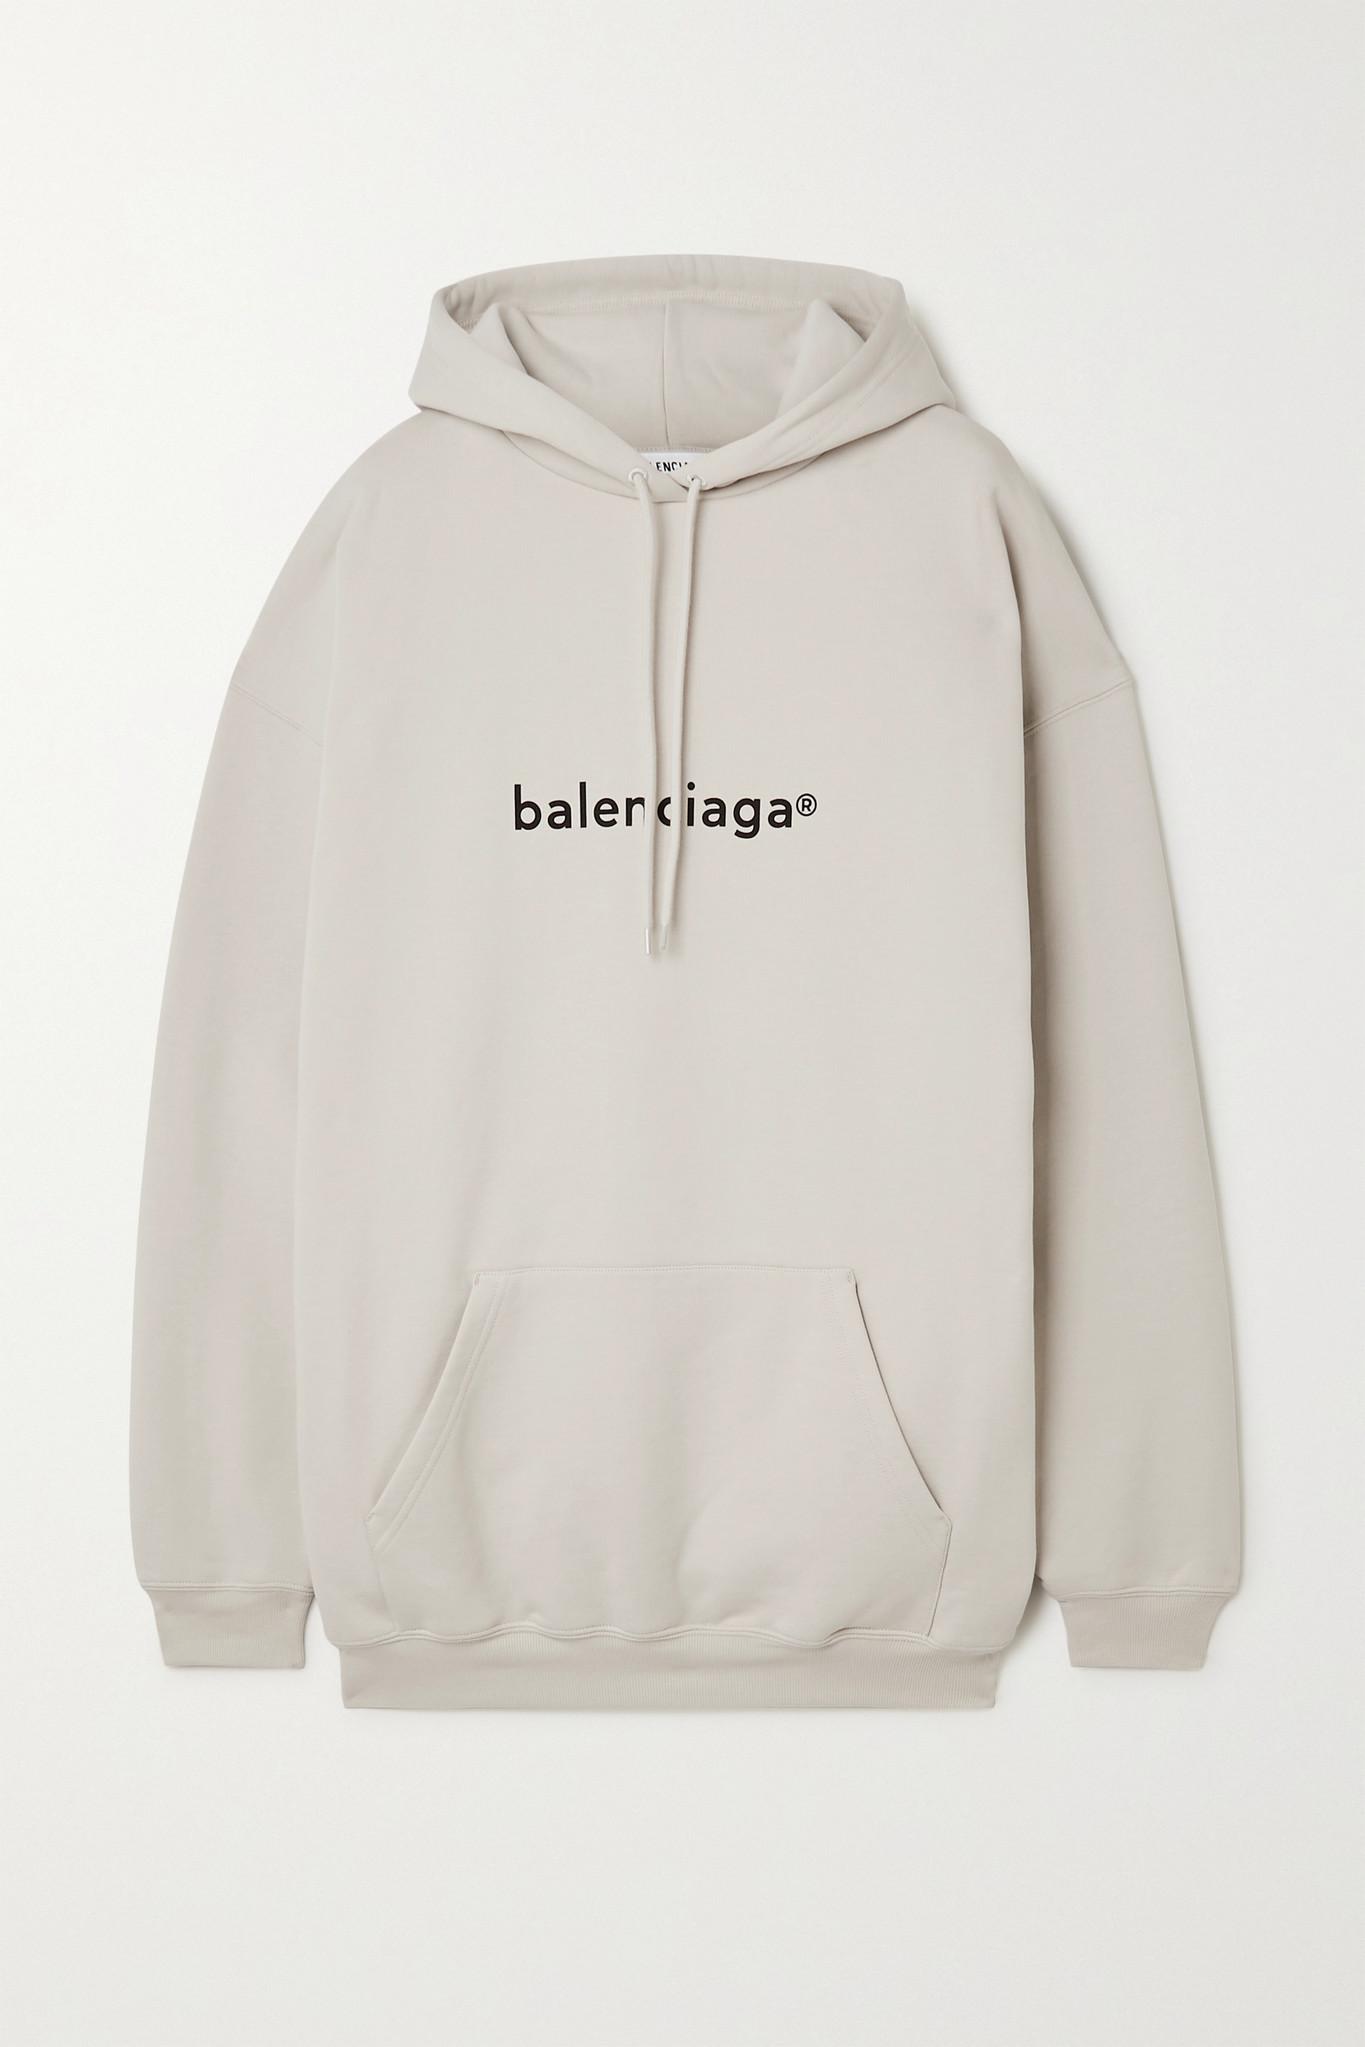 BALENCIAGA - 大廓形印花纯棉平纹布帽衫 - 白色 - small